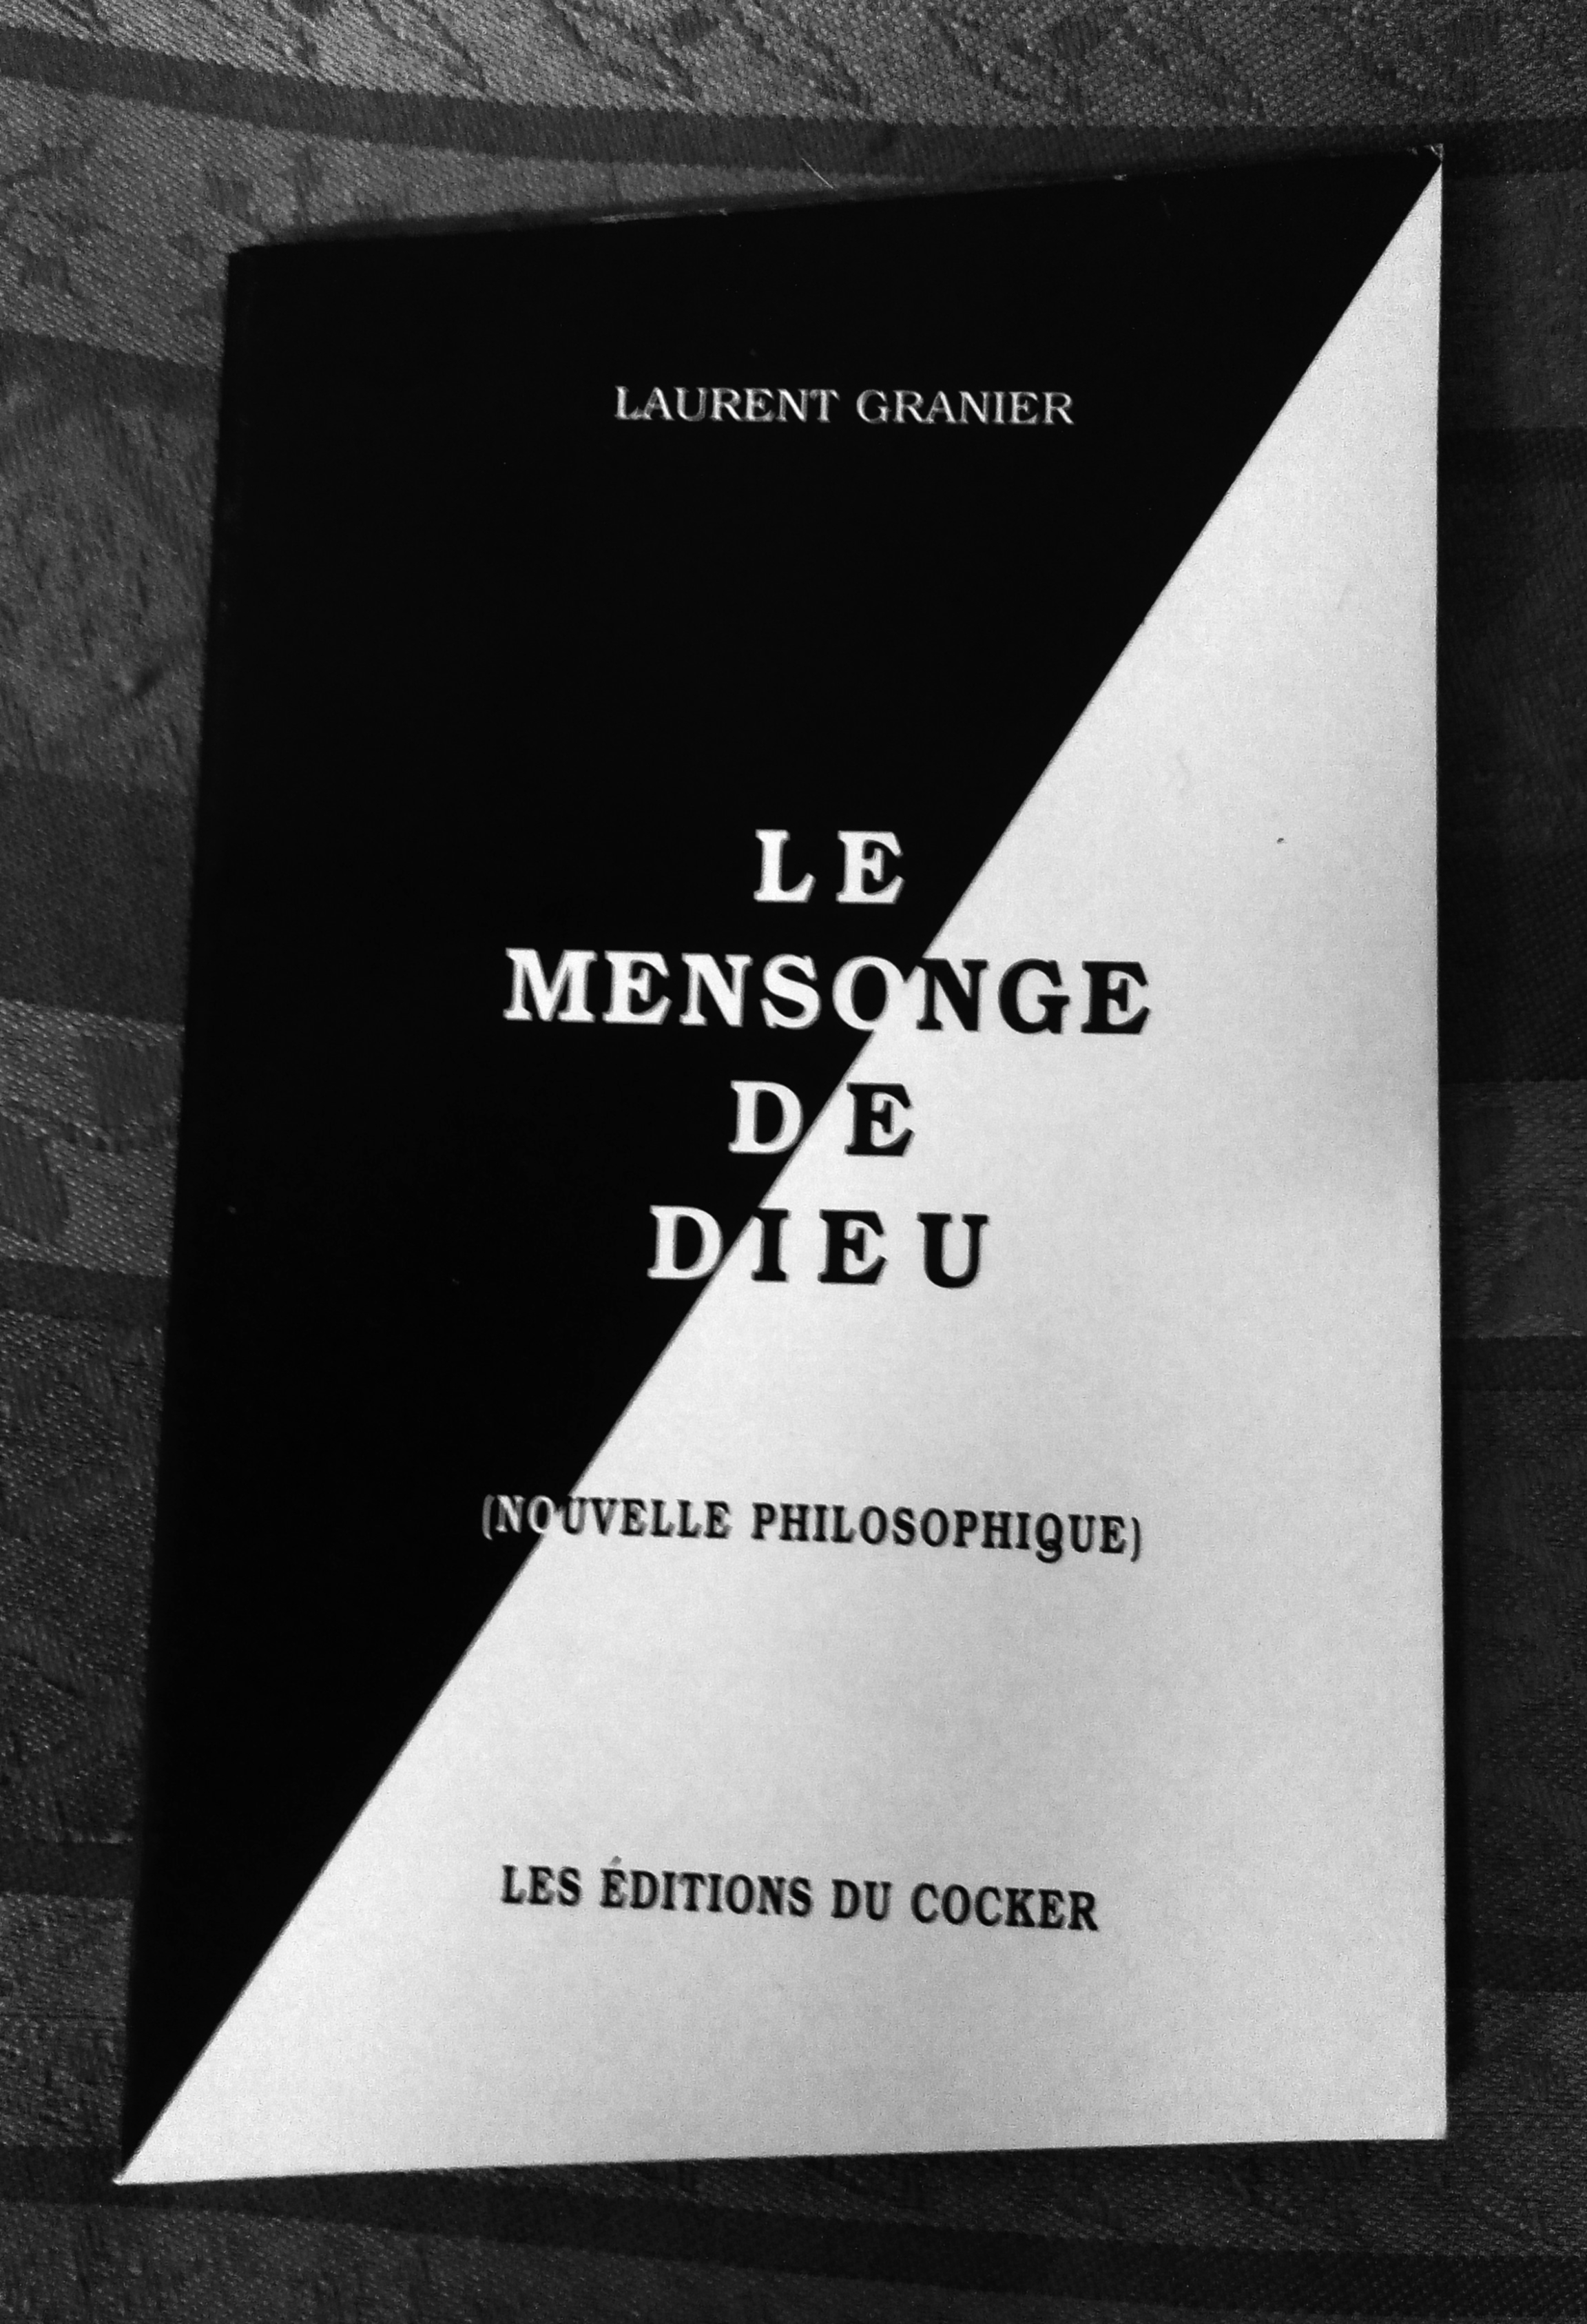 Laurent Granier